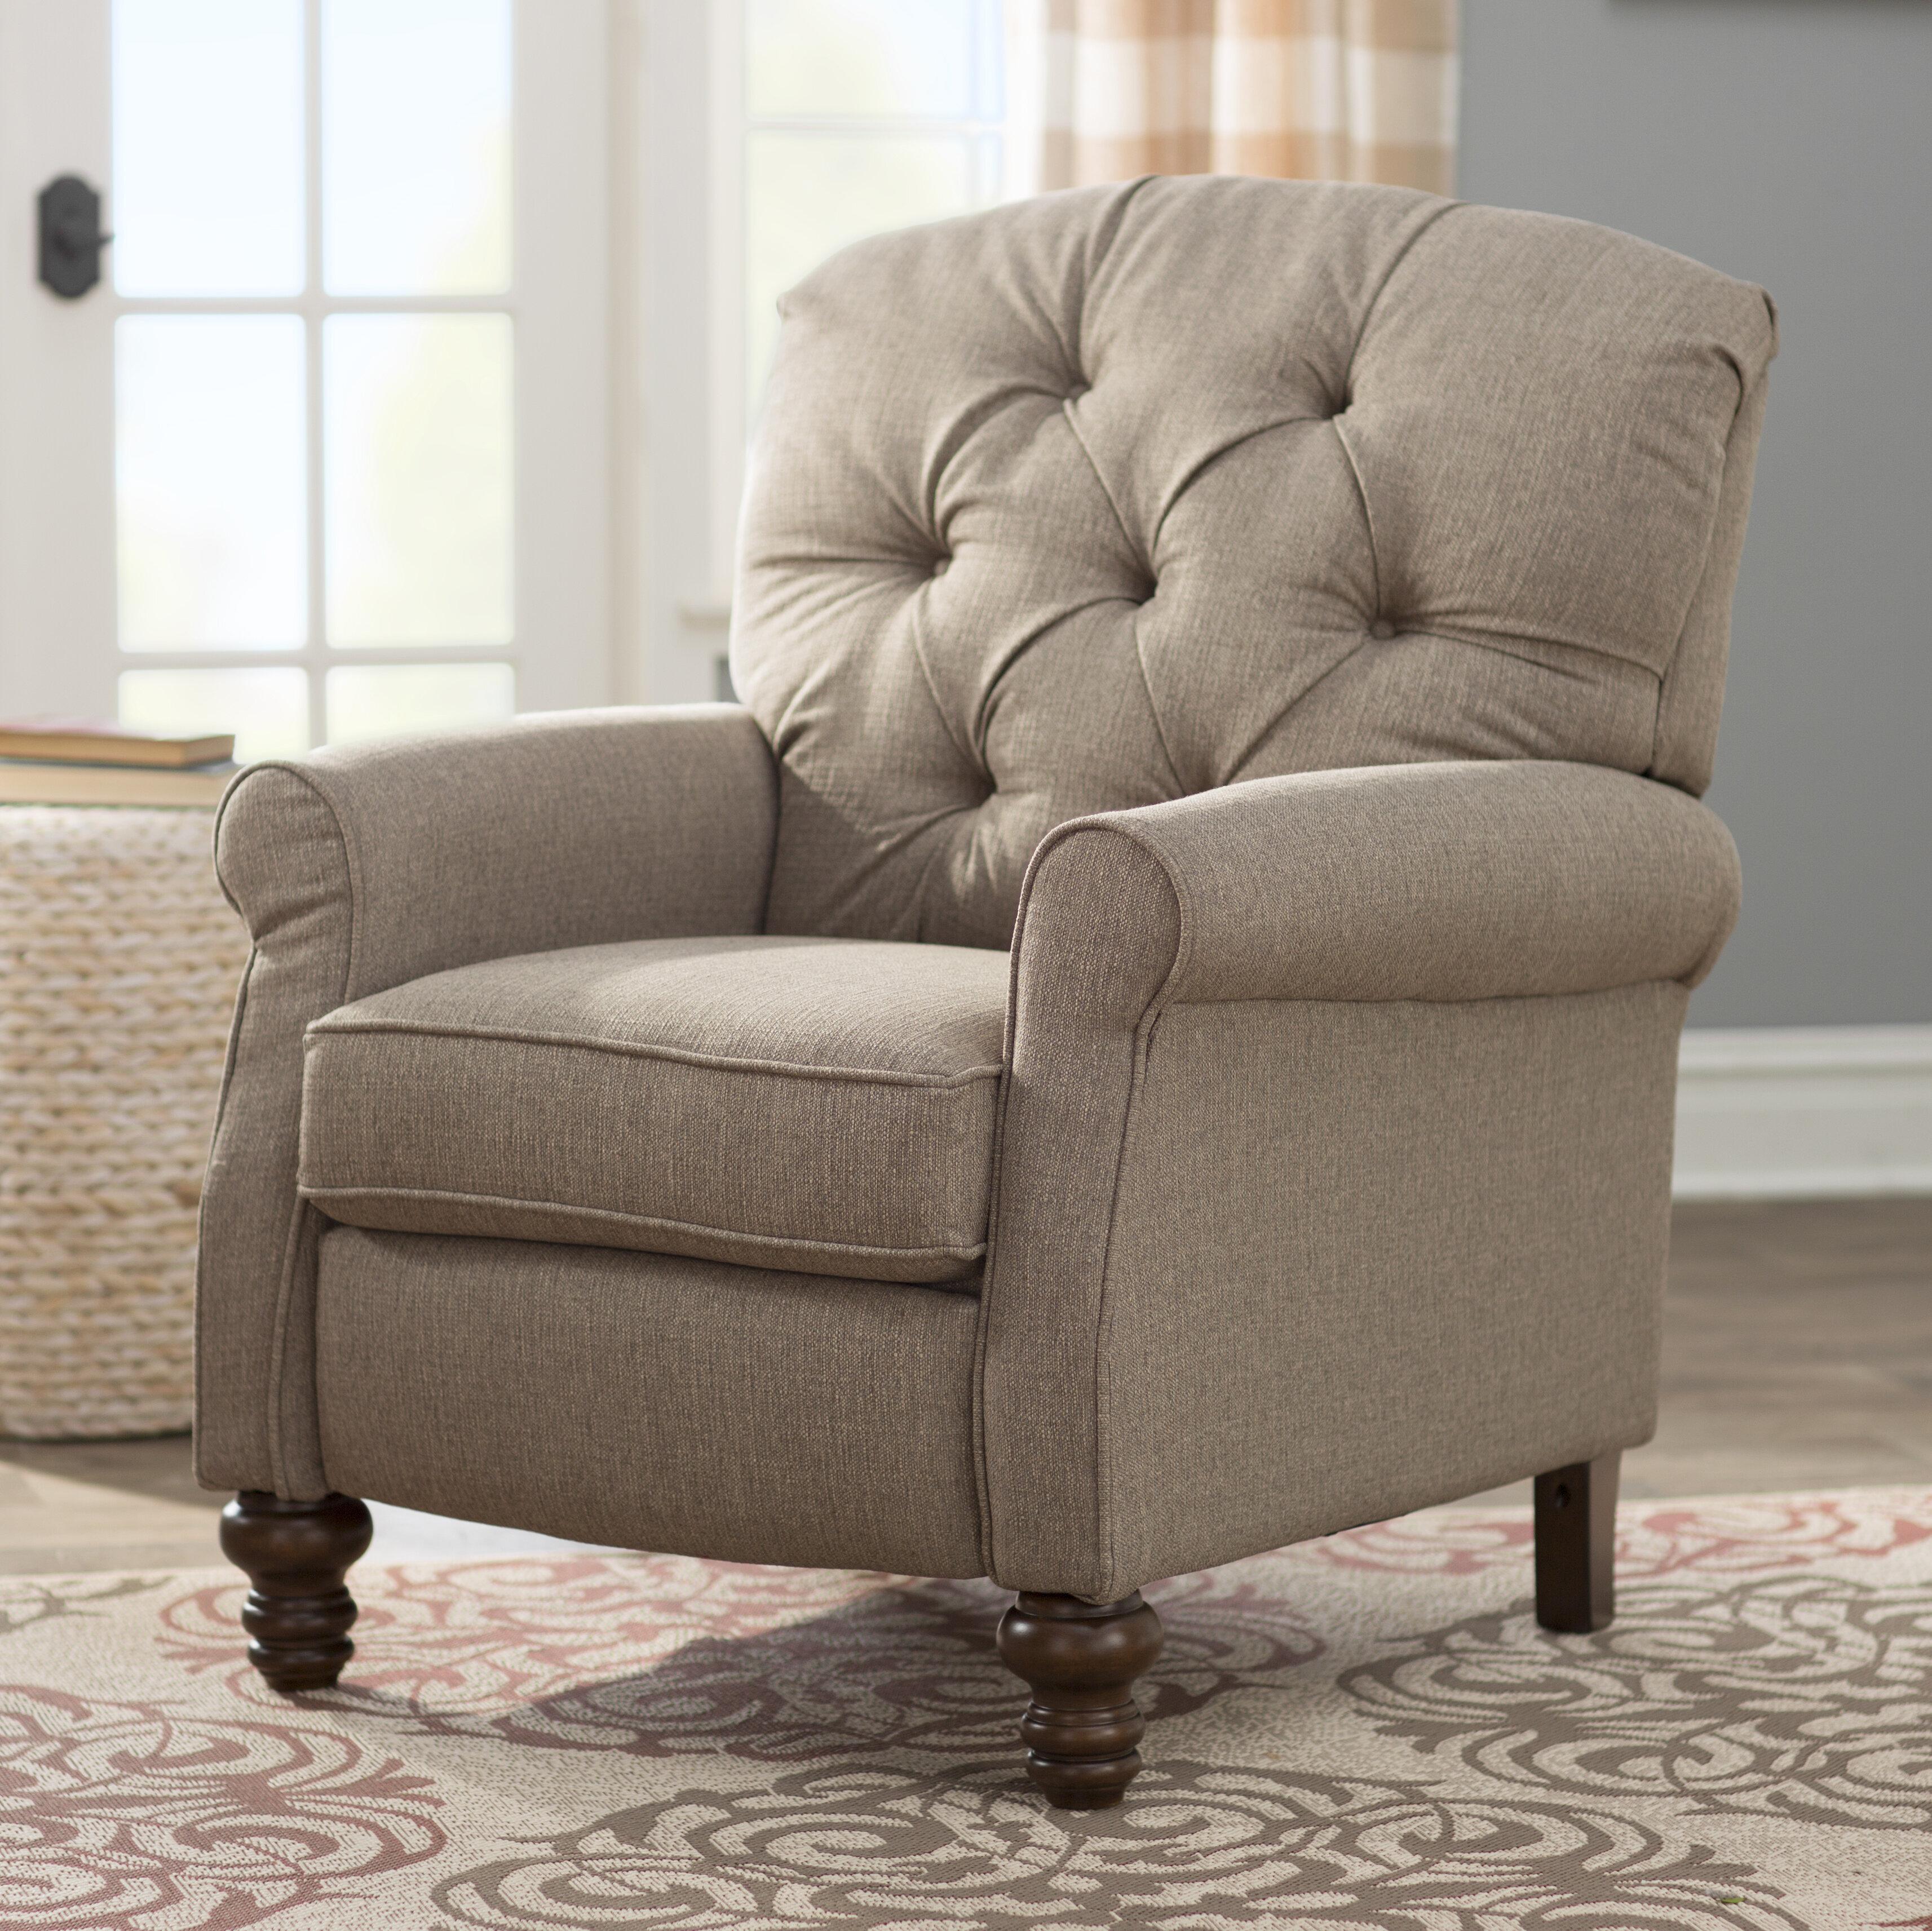 arm ordinary gustav antique chair inspired morris reclining large bent rocker stickley of photo slant recliner x